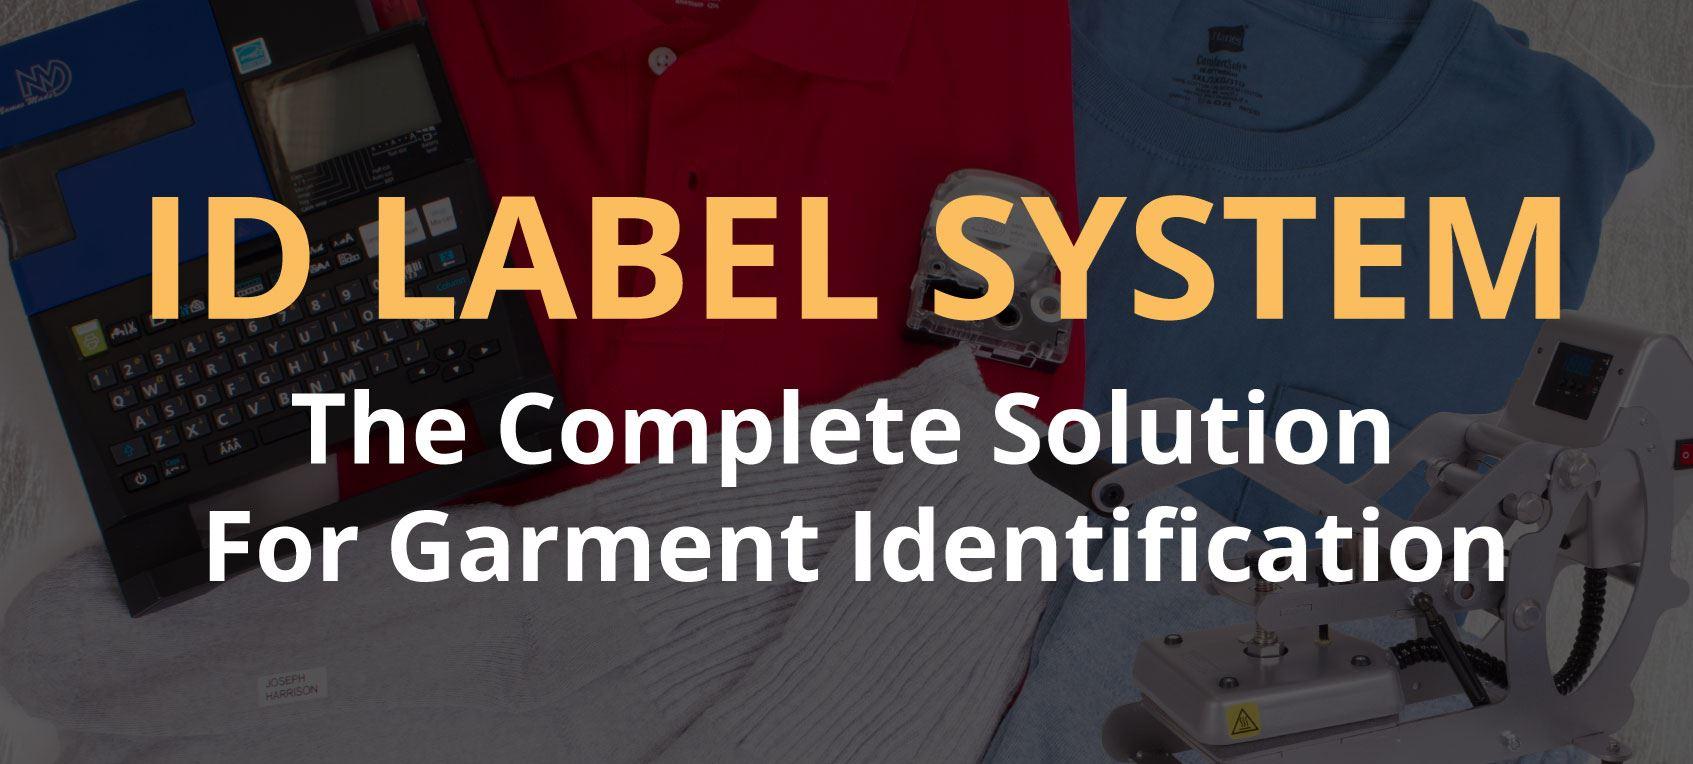 ID Label System